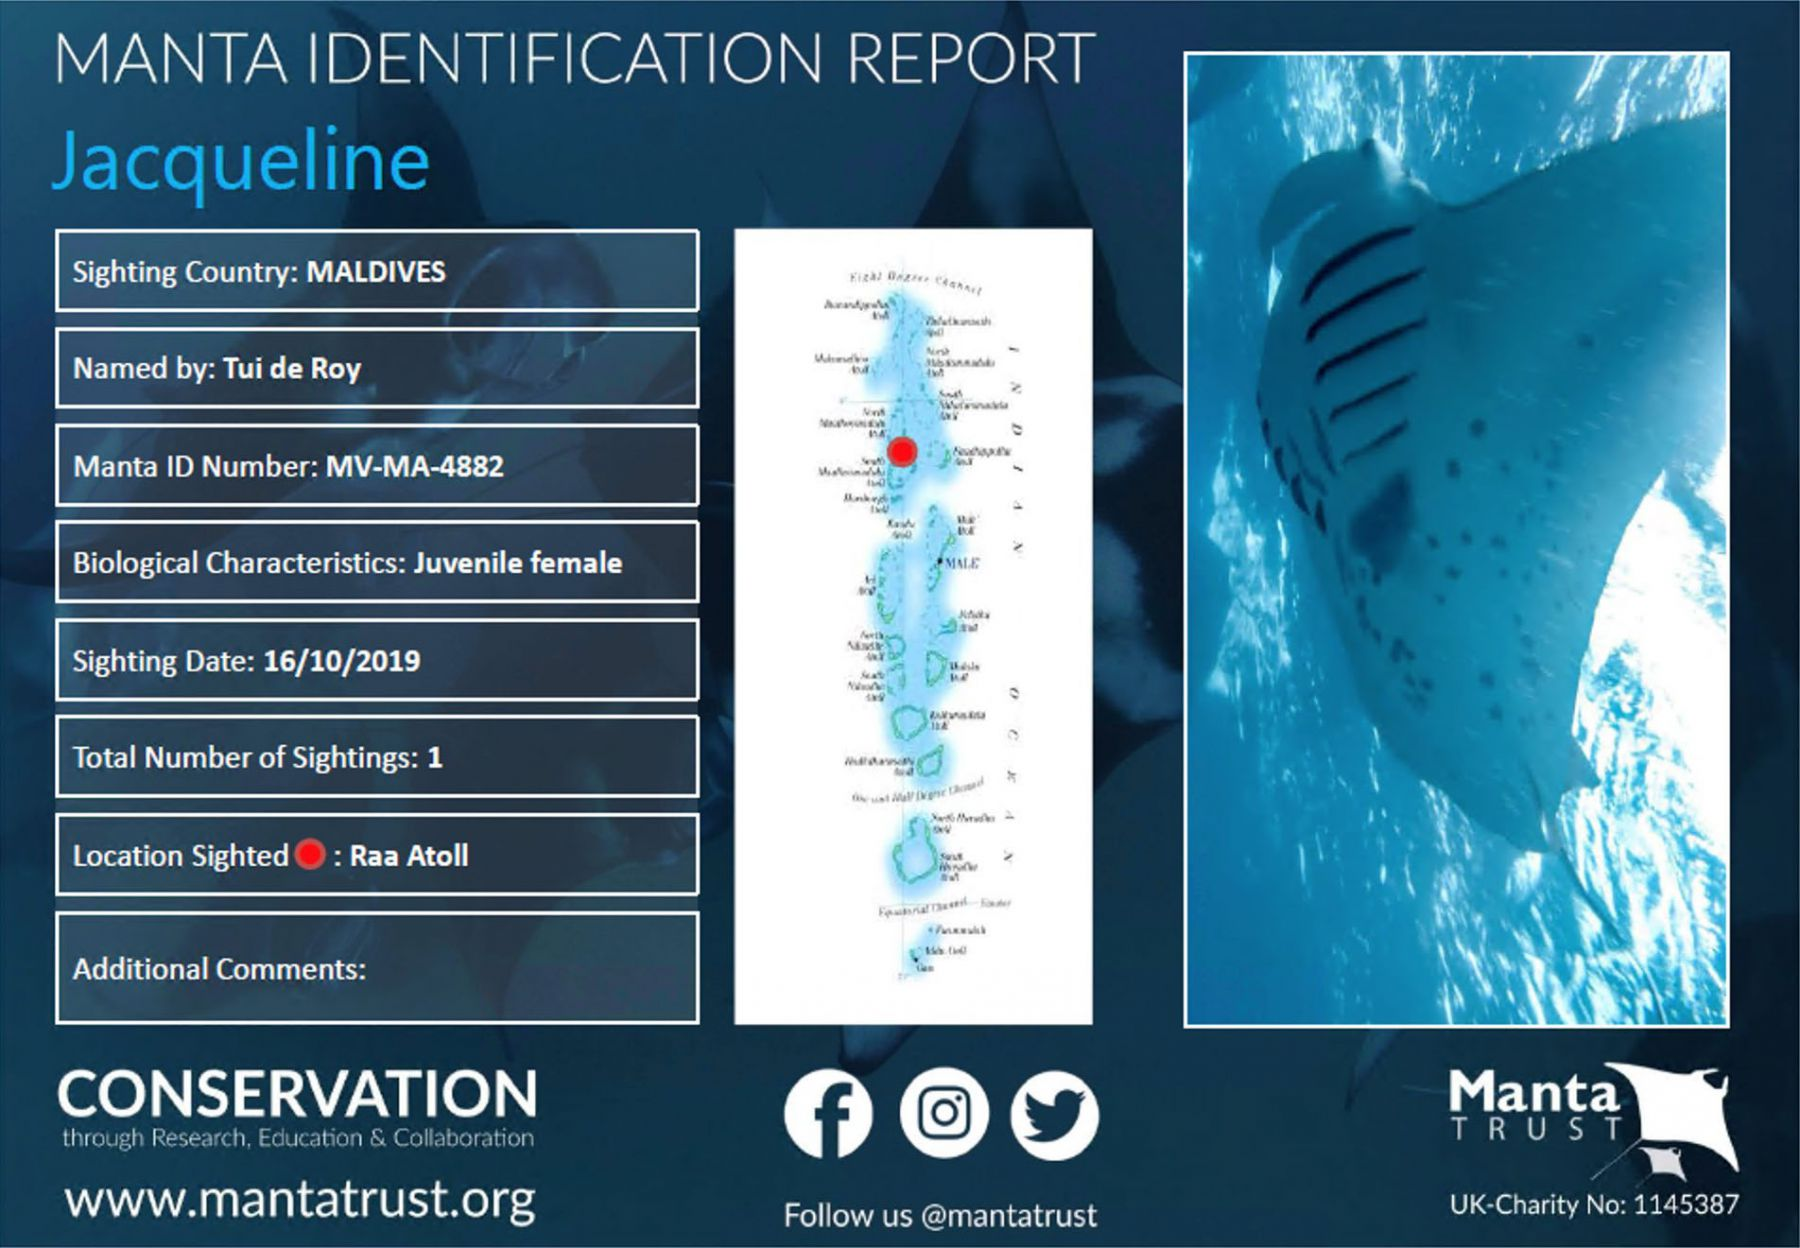 Manta Ray Identification Report - Jacqueline